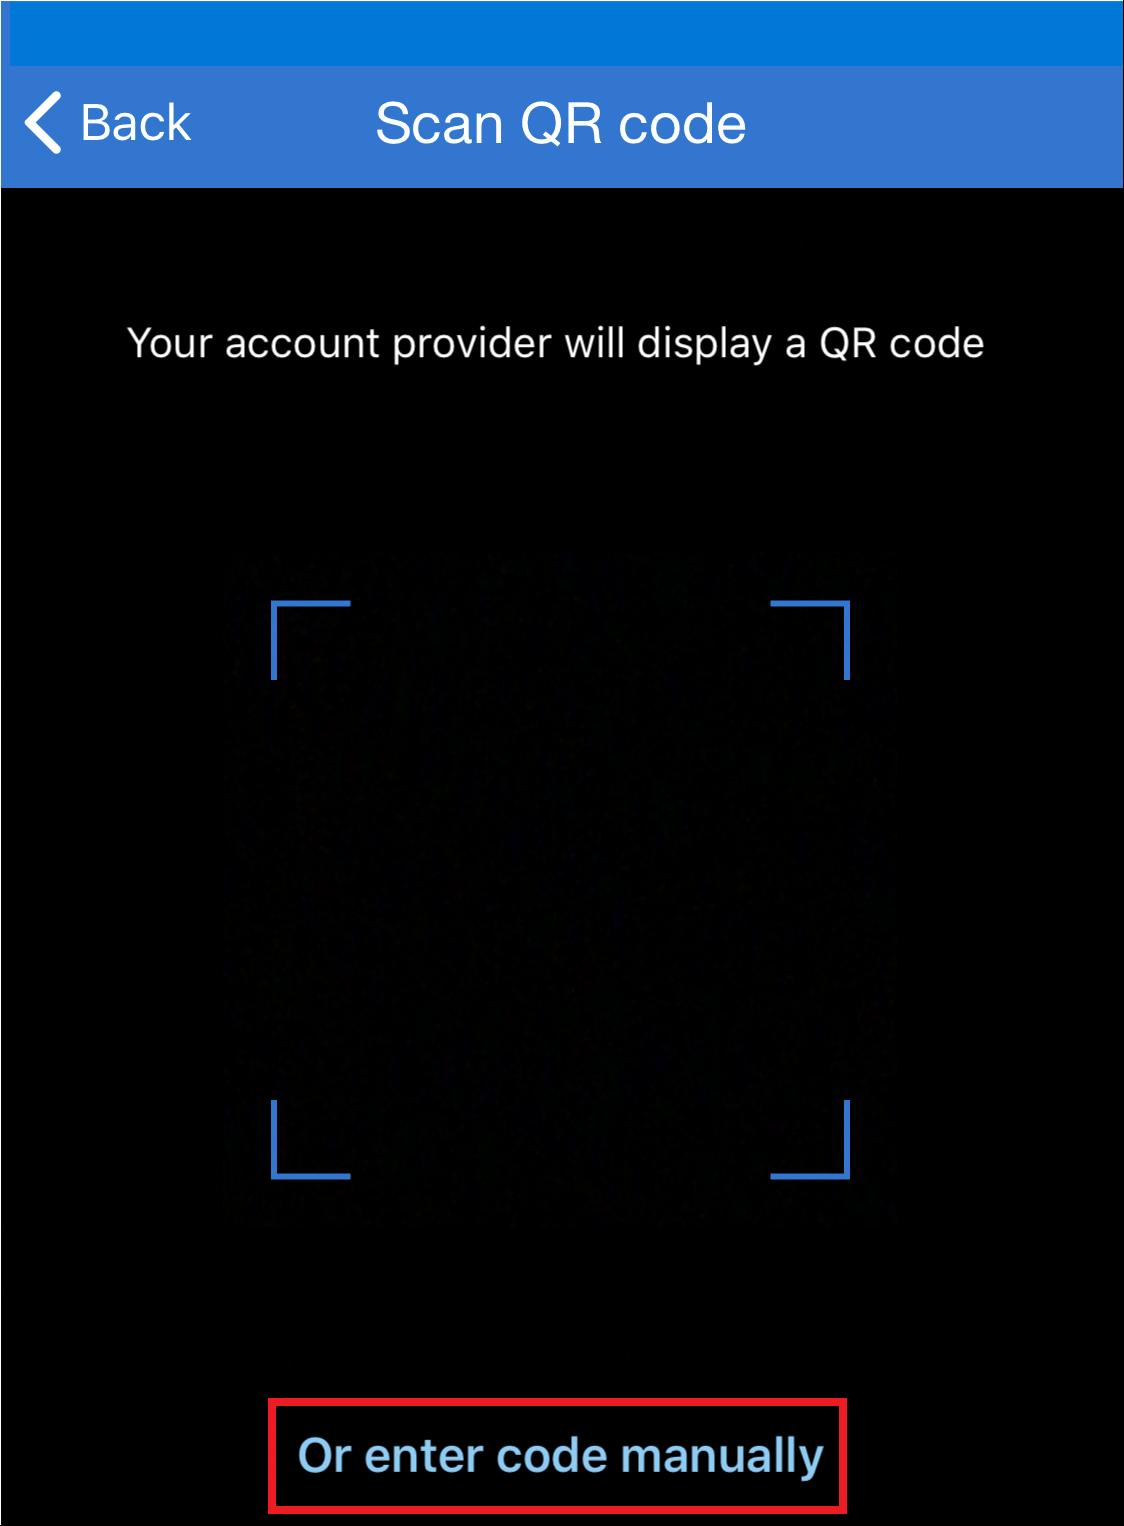 A screenshot from an iPhone to scan a QR code.